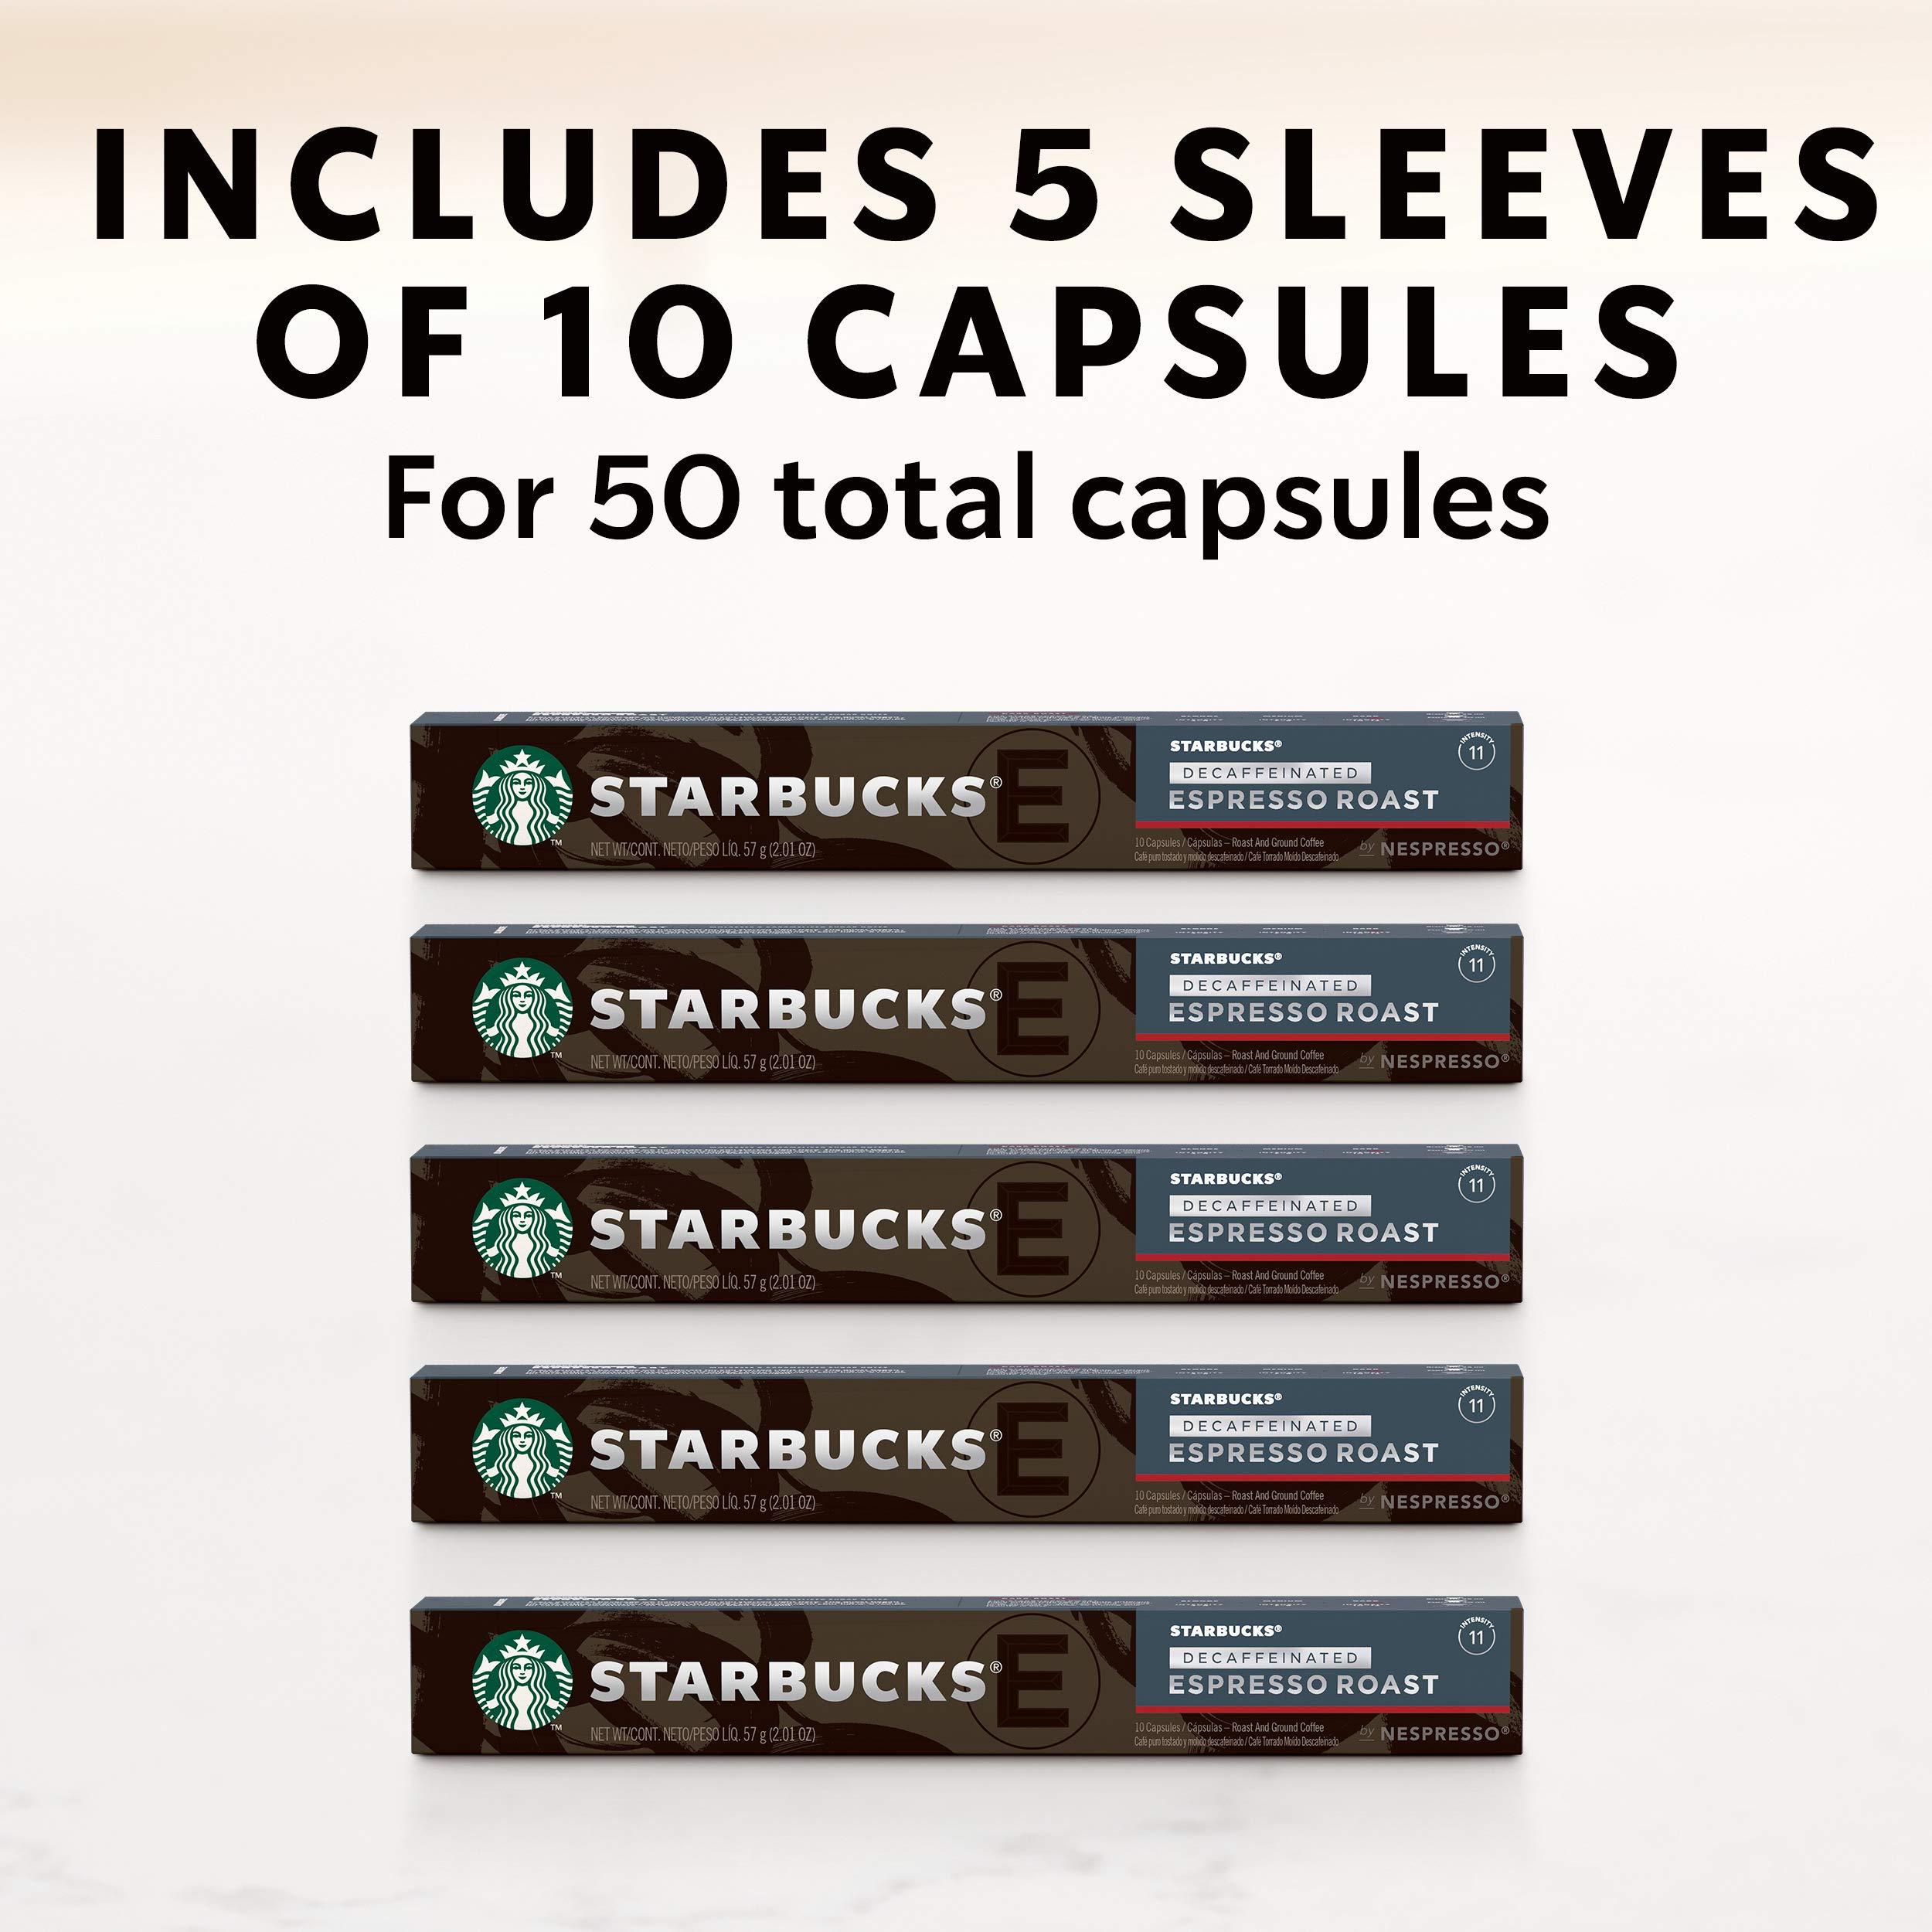 Starbucks by Nespresso, Decaf Espresso Dark Roast (50-count single serve capsules, compatible with Nespresso Original Line System) by Starbucks for Nespresso (Image #7)